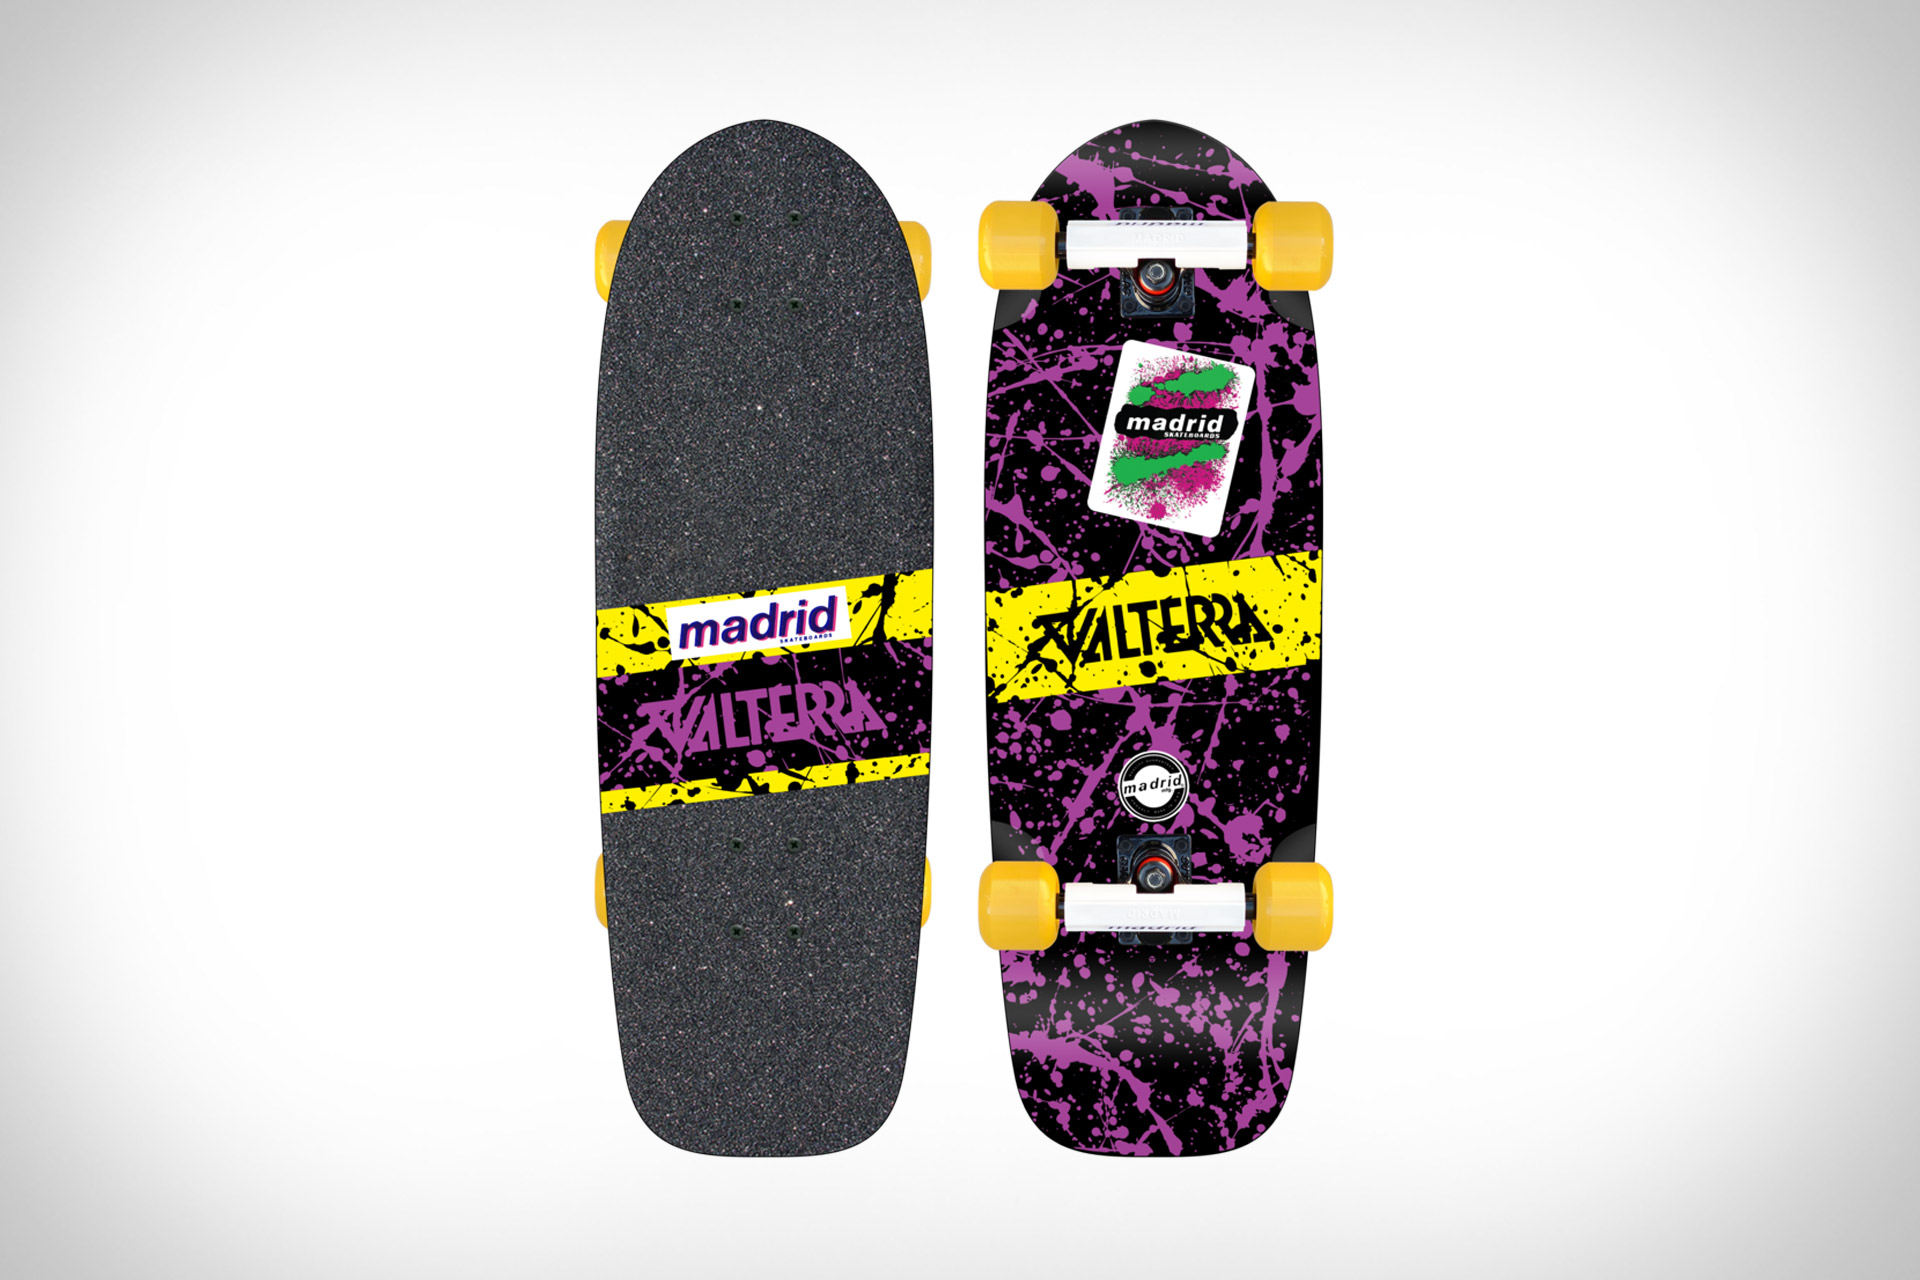 Madrid x Back to the Future Valterra Skateboard